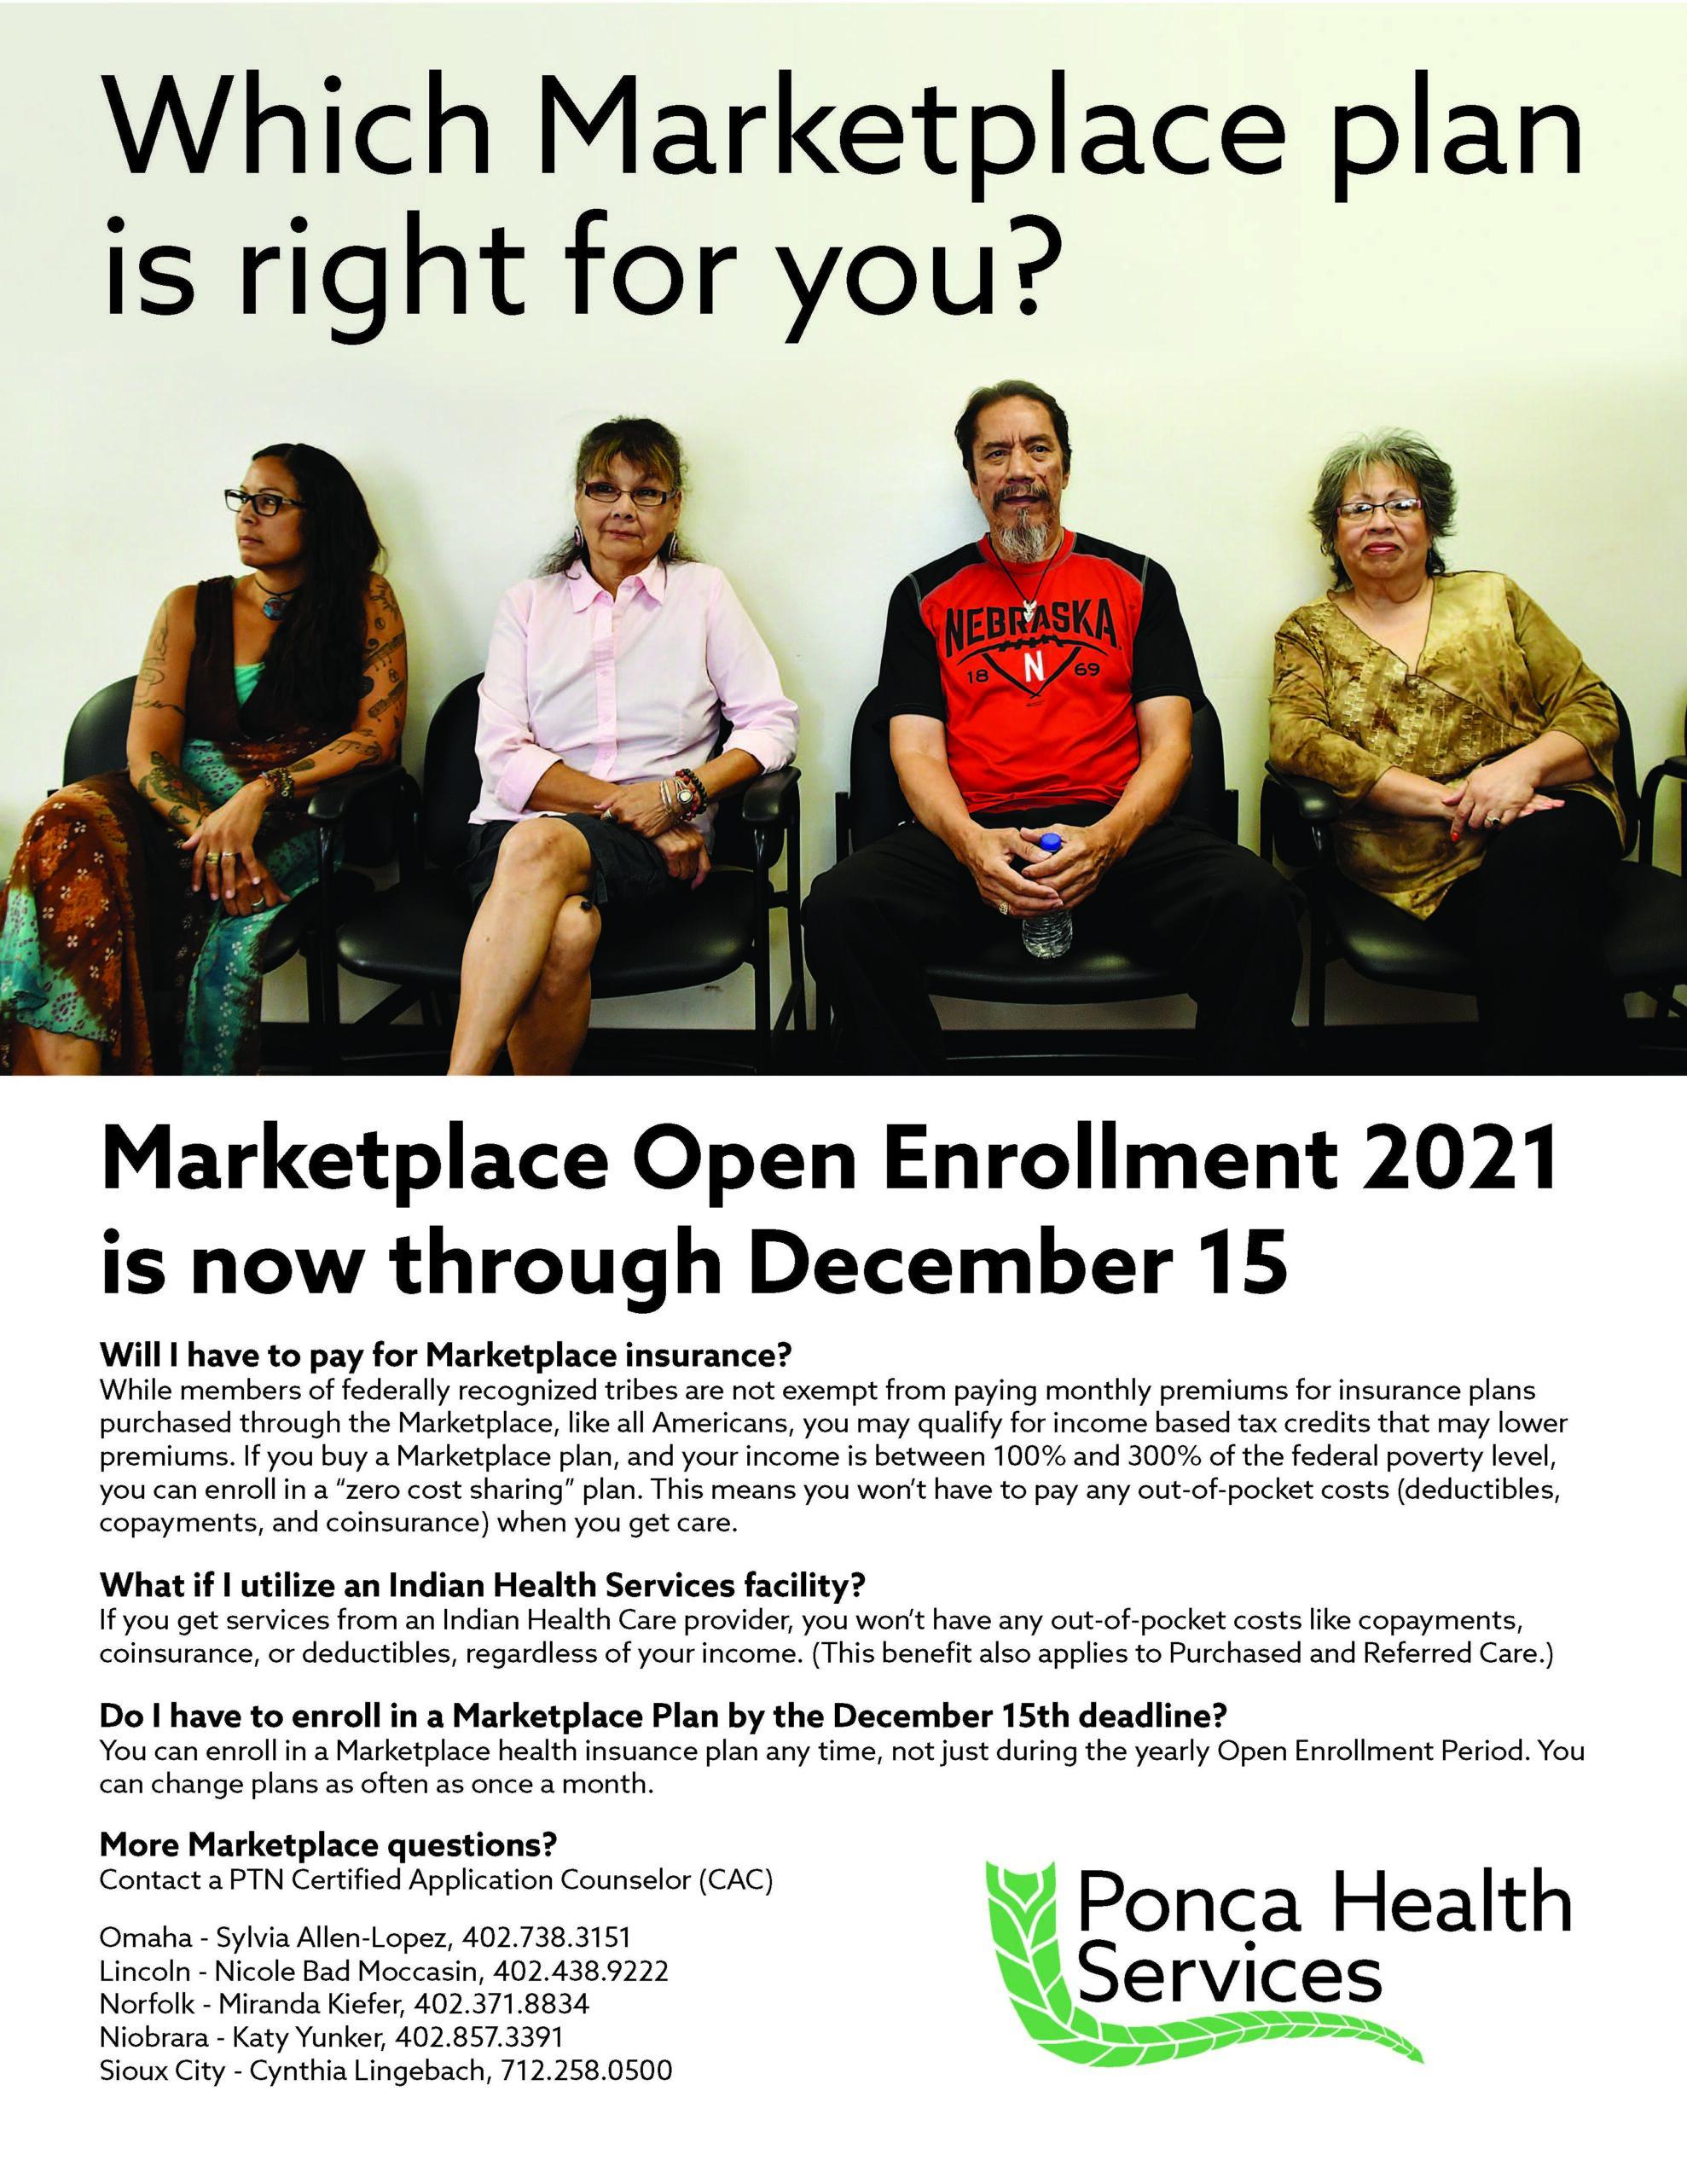 Marketplace Open Enrollment 2021 is now through December 15.